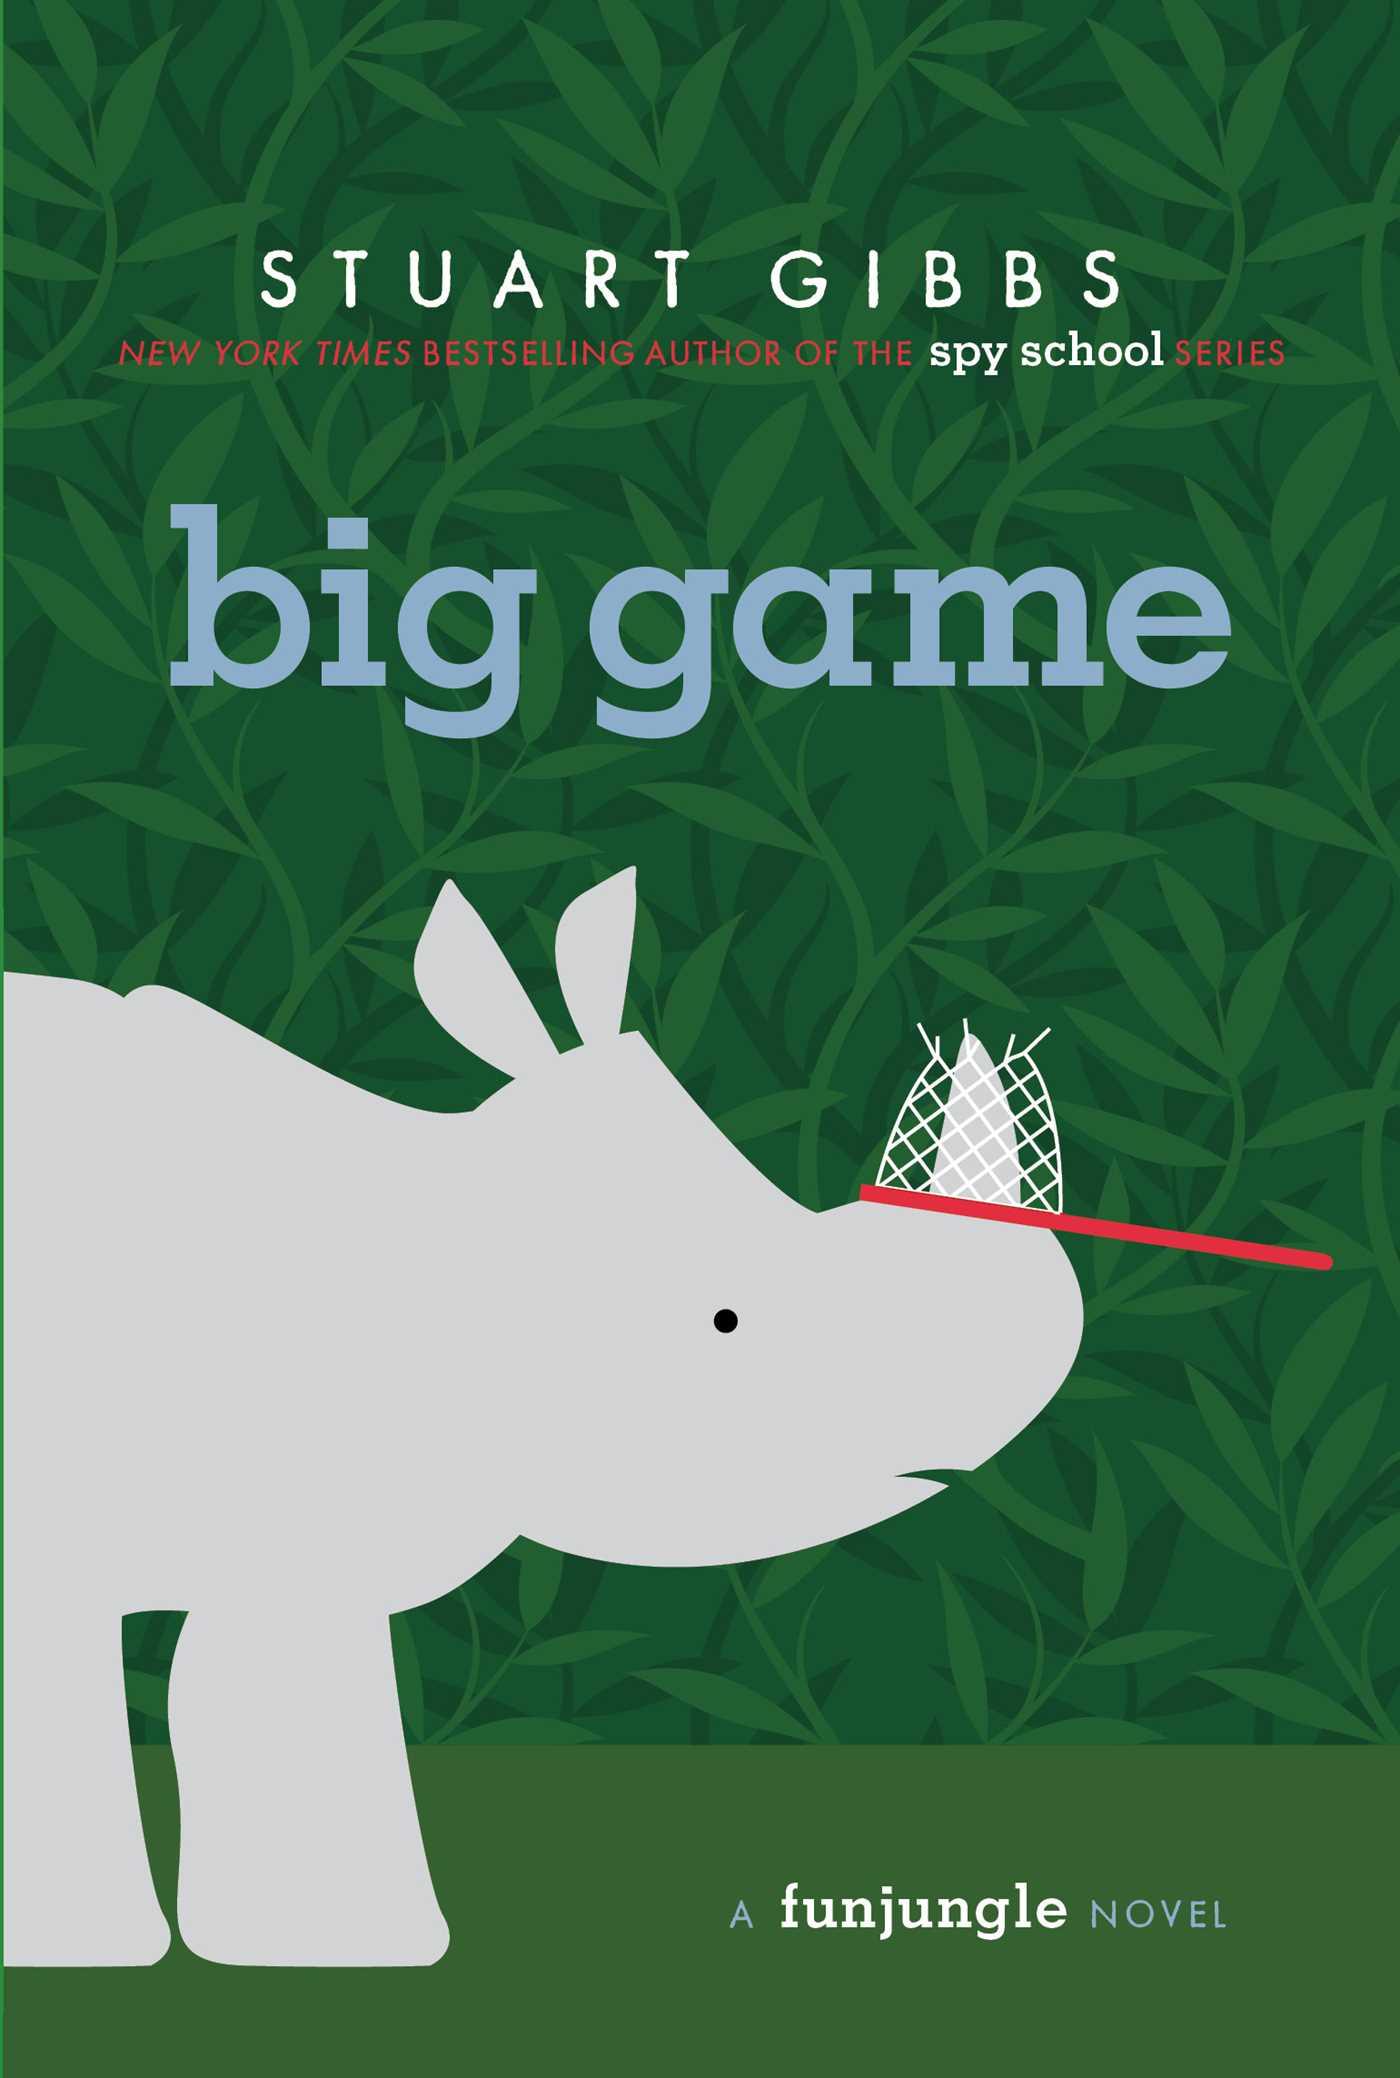 gibbs-big-game.jpg